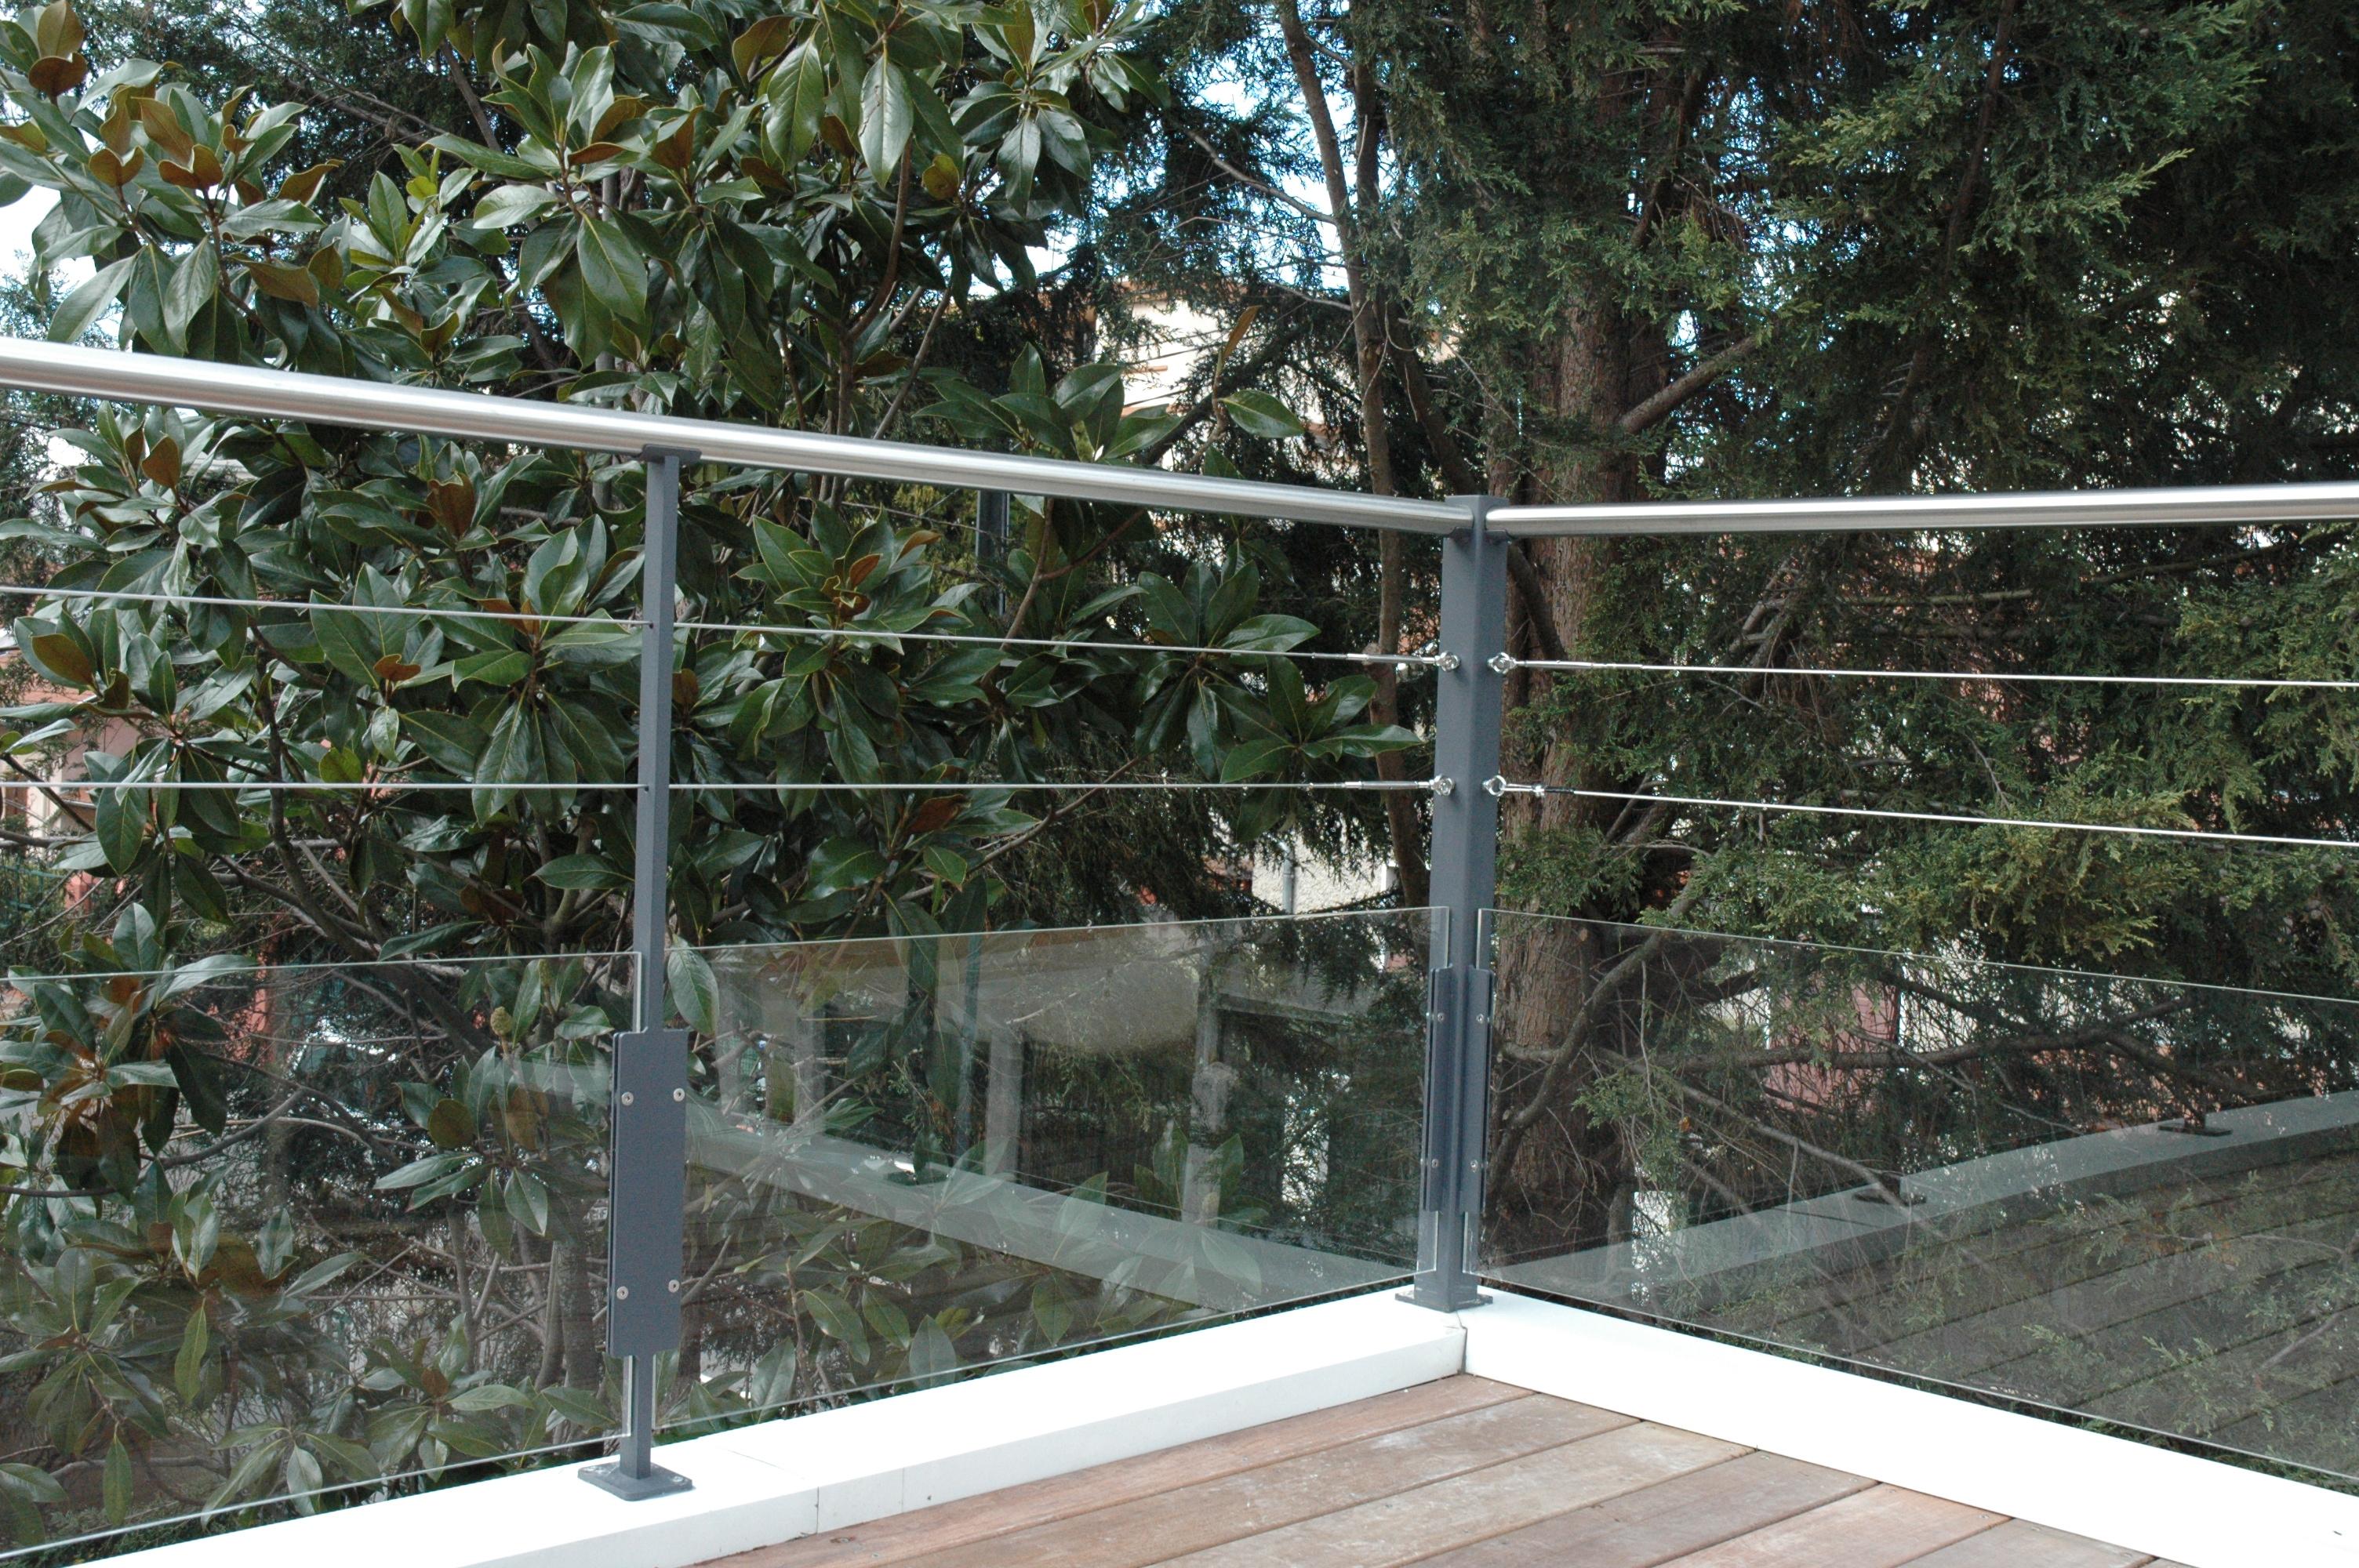 garde corps exonido inox et pmma exonido pergolas sur mesure am nagement de terrasse. Black Bedroom Furniture Sets. Home Design Ideas